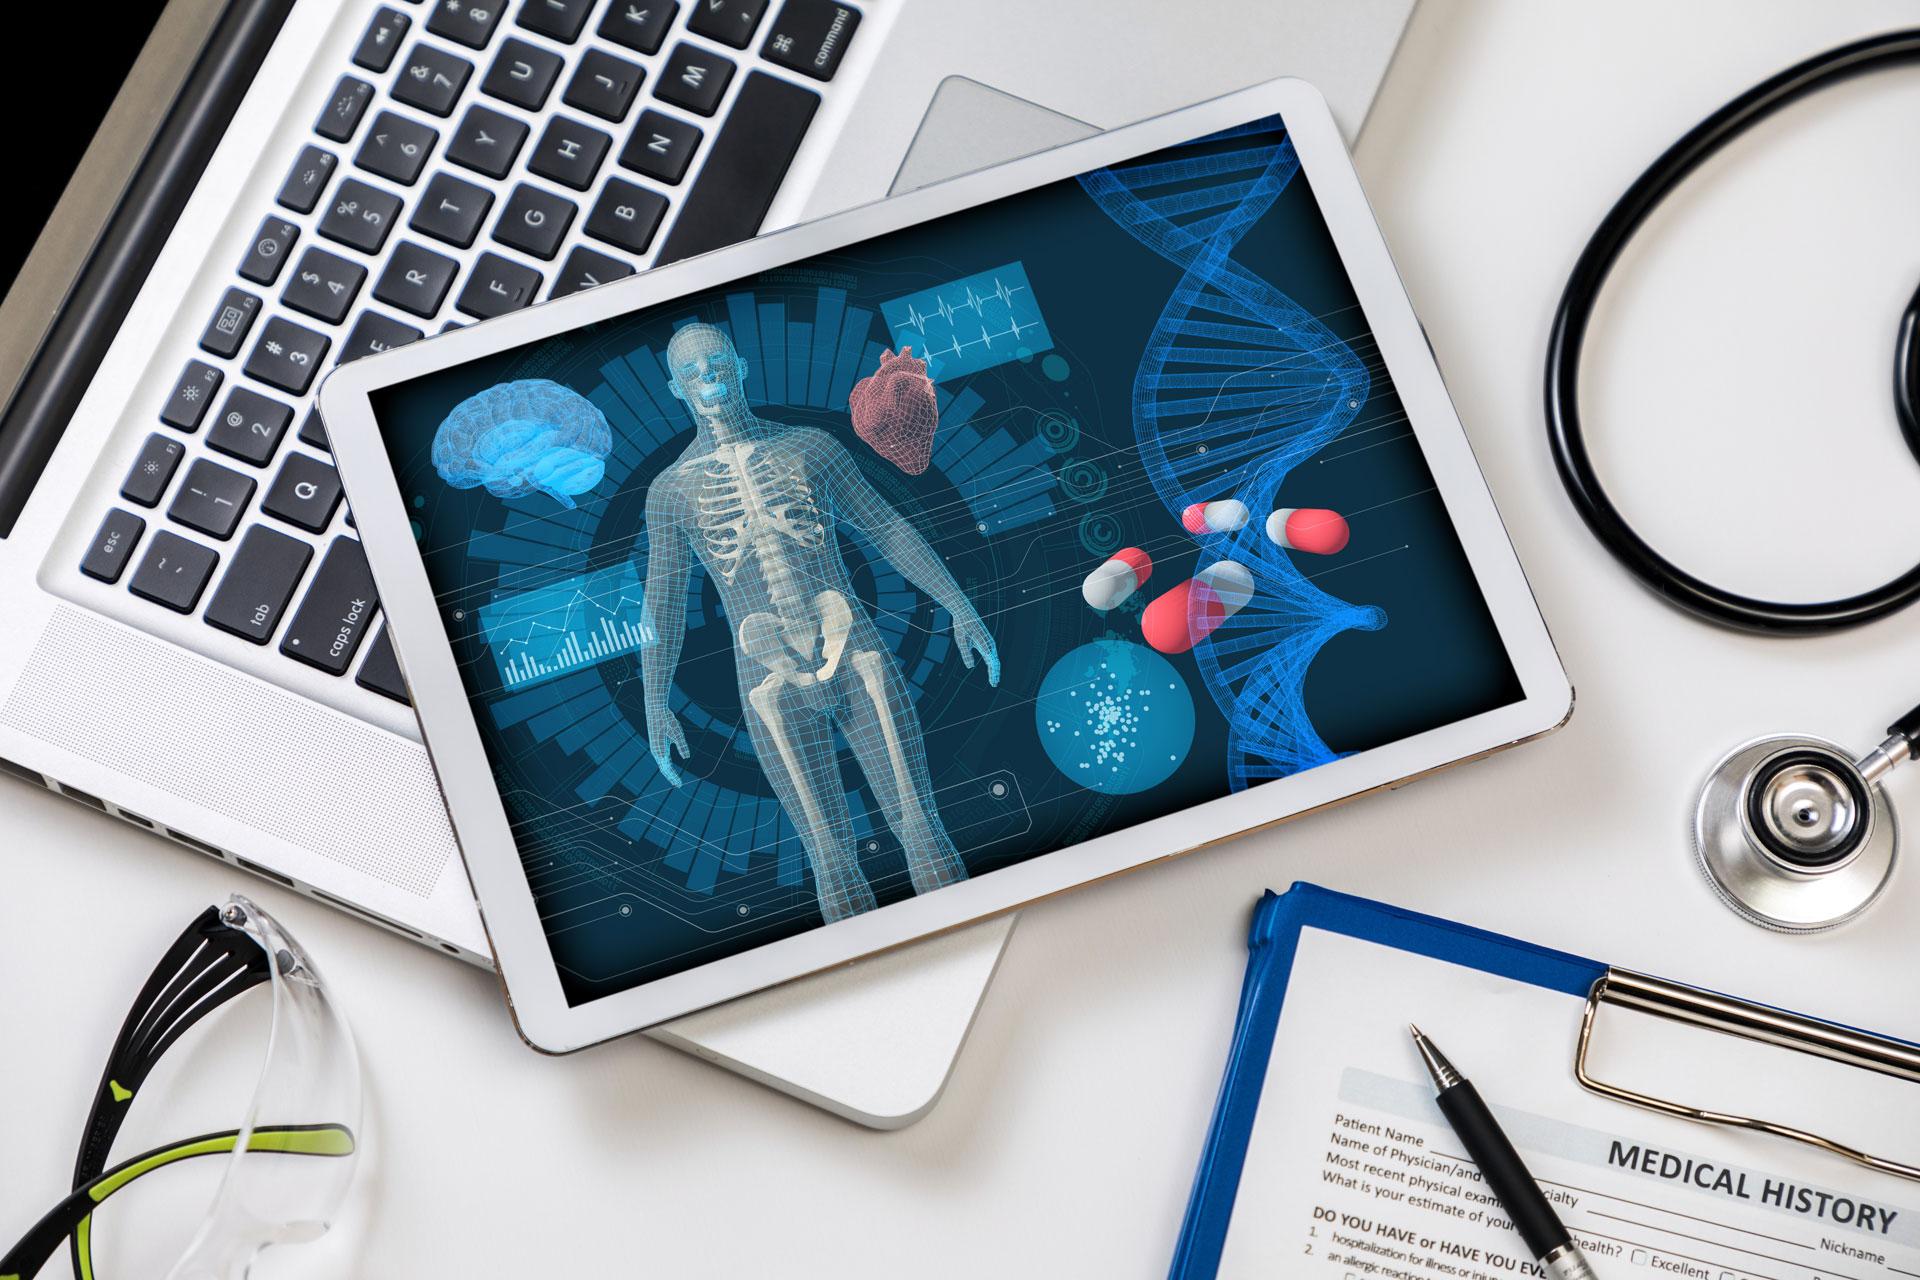 Dr Ιωσηφίδης Μιχαήλ Χειρουργός Ορθοπαιδικός Θεσσαλονίκη, Αρθροσκόπηση, Αρθροπλαστική, αρθροπλαστική γόνατος, ολική αρθροπλαστική ισχίου.